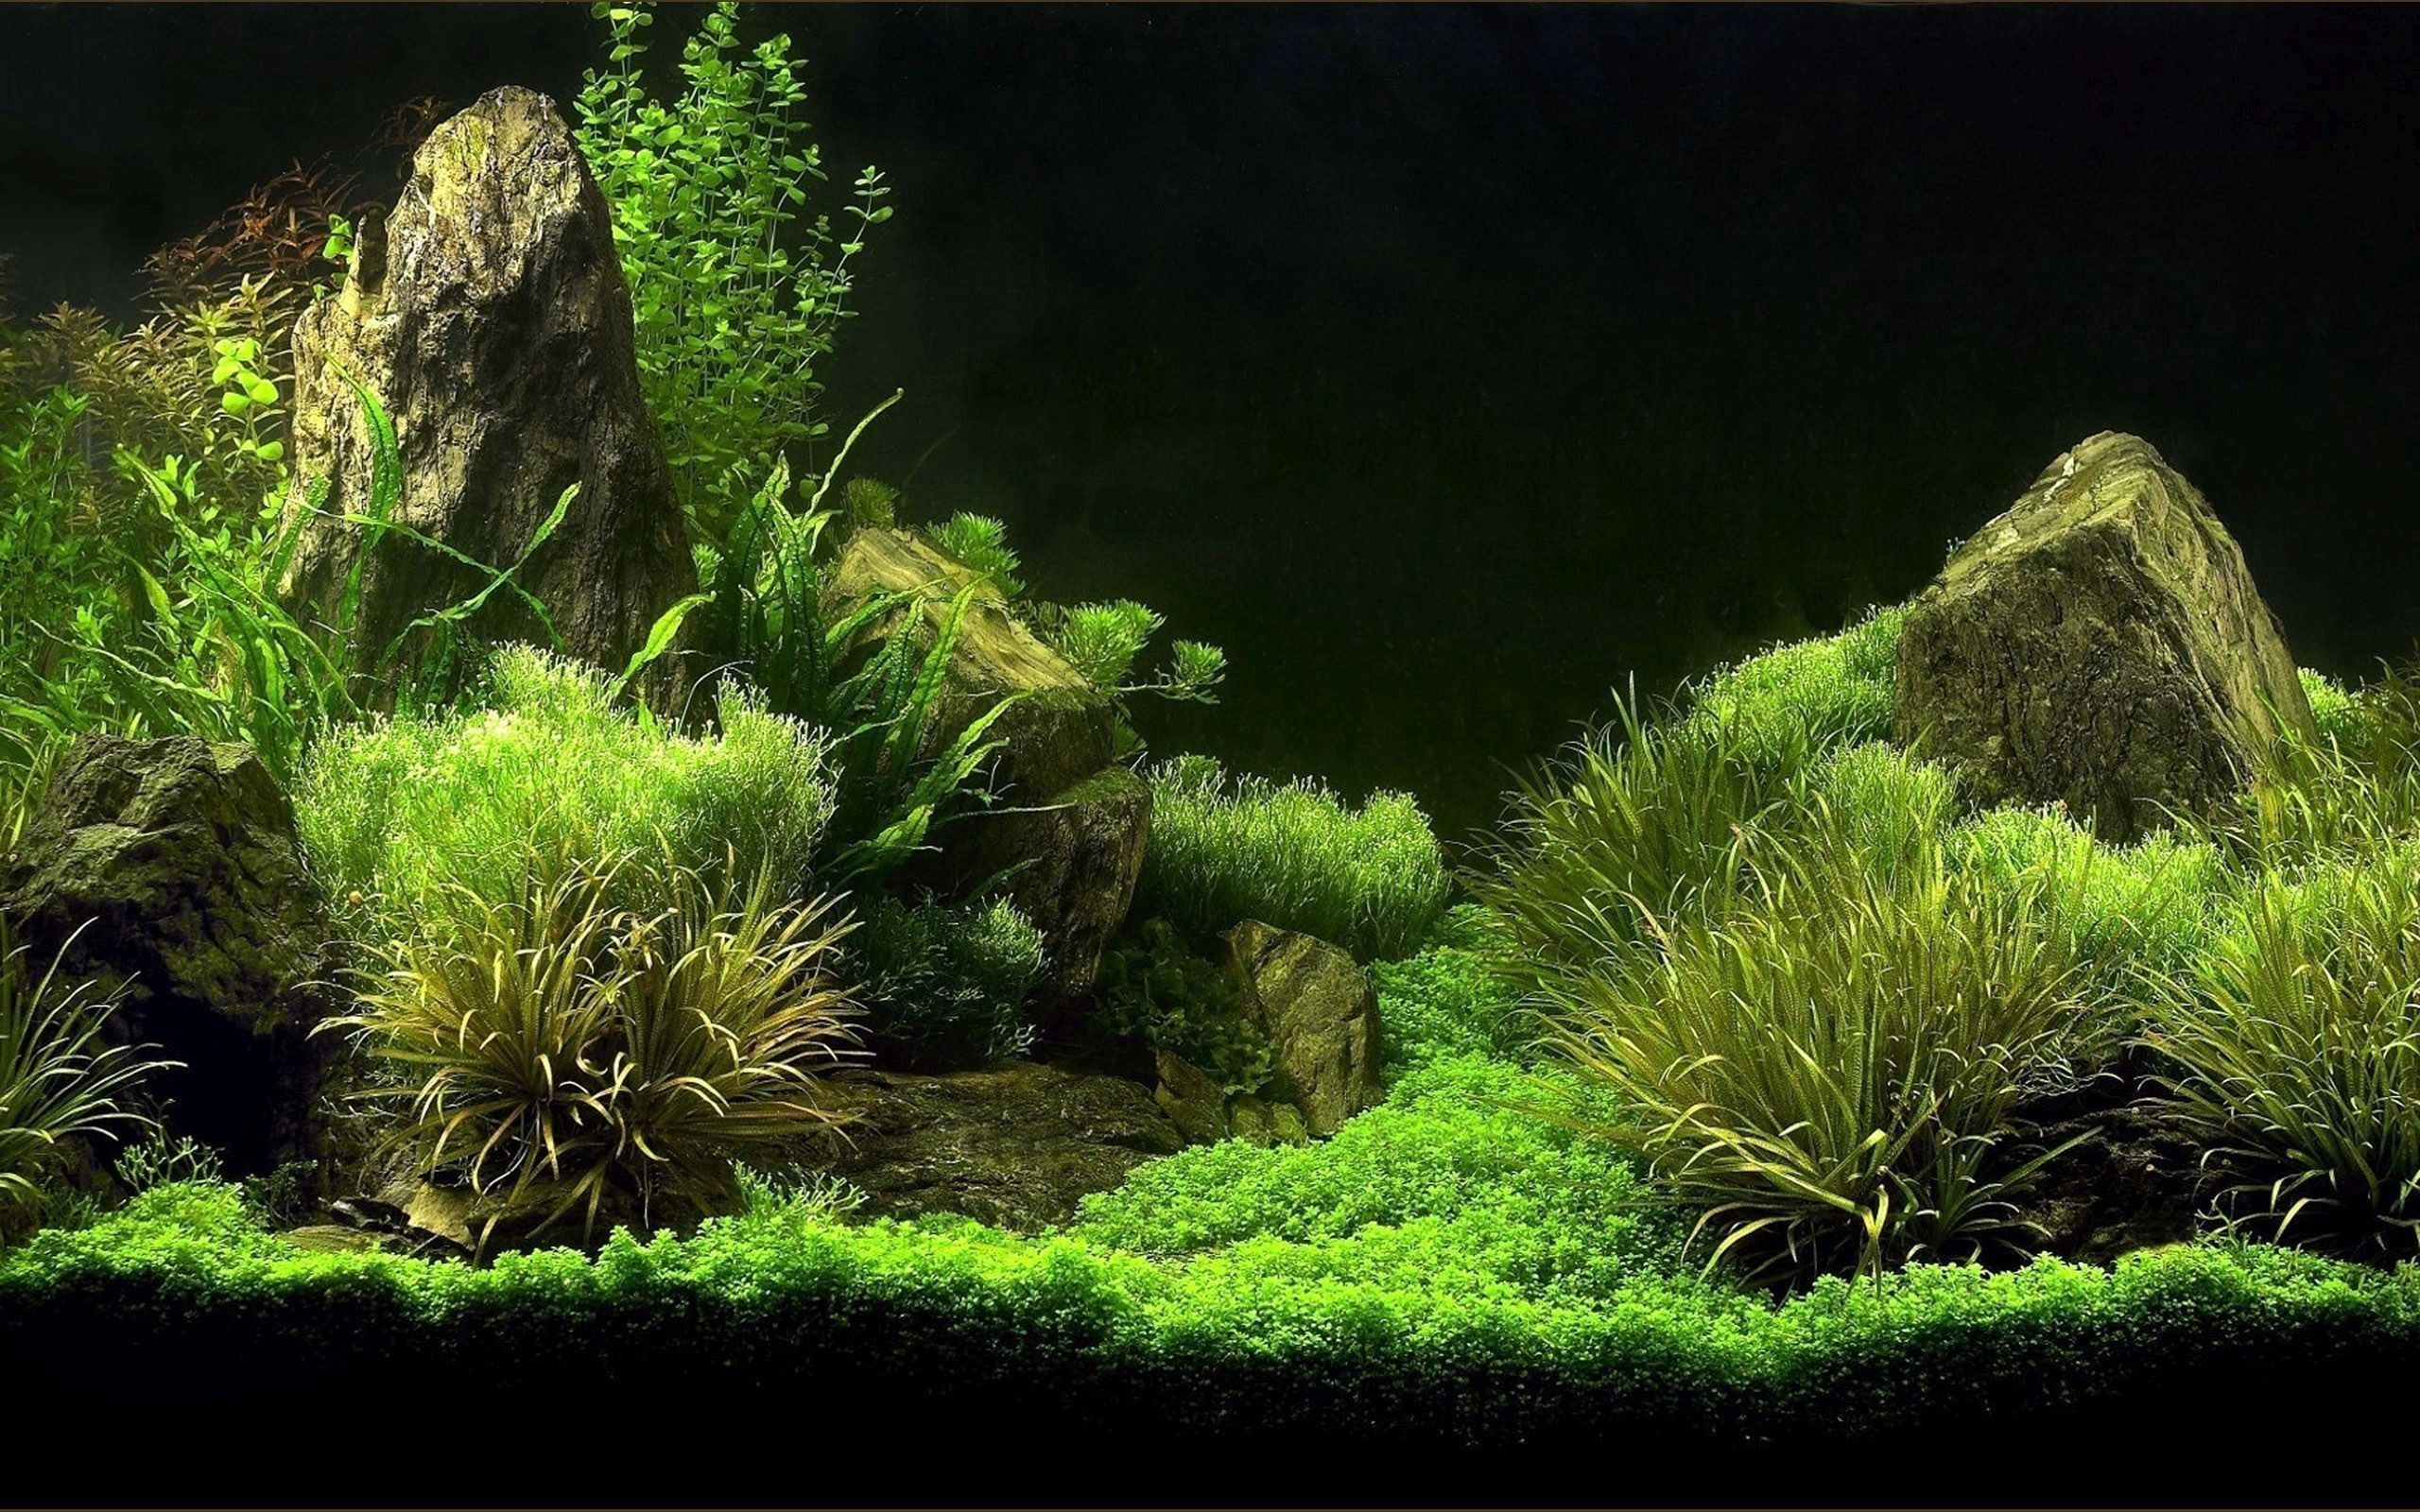 72 Aquarium Desktop Wallpapers On Wallpaperplay